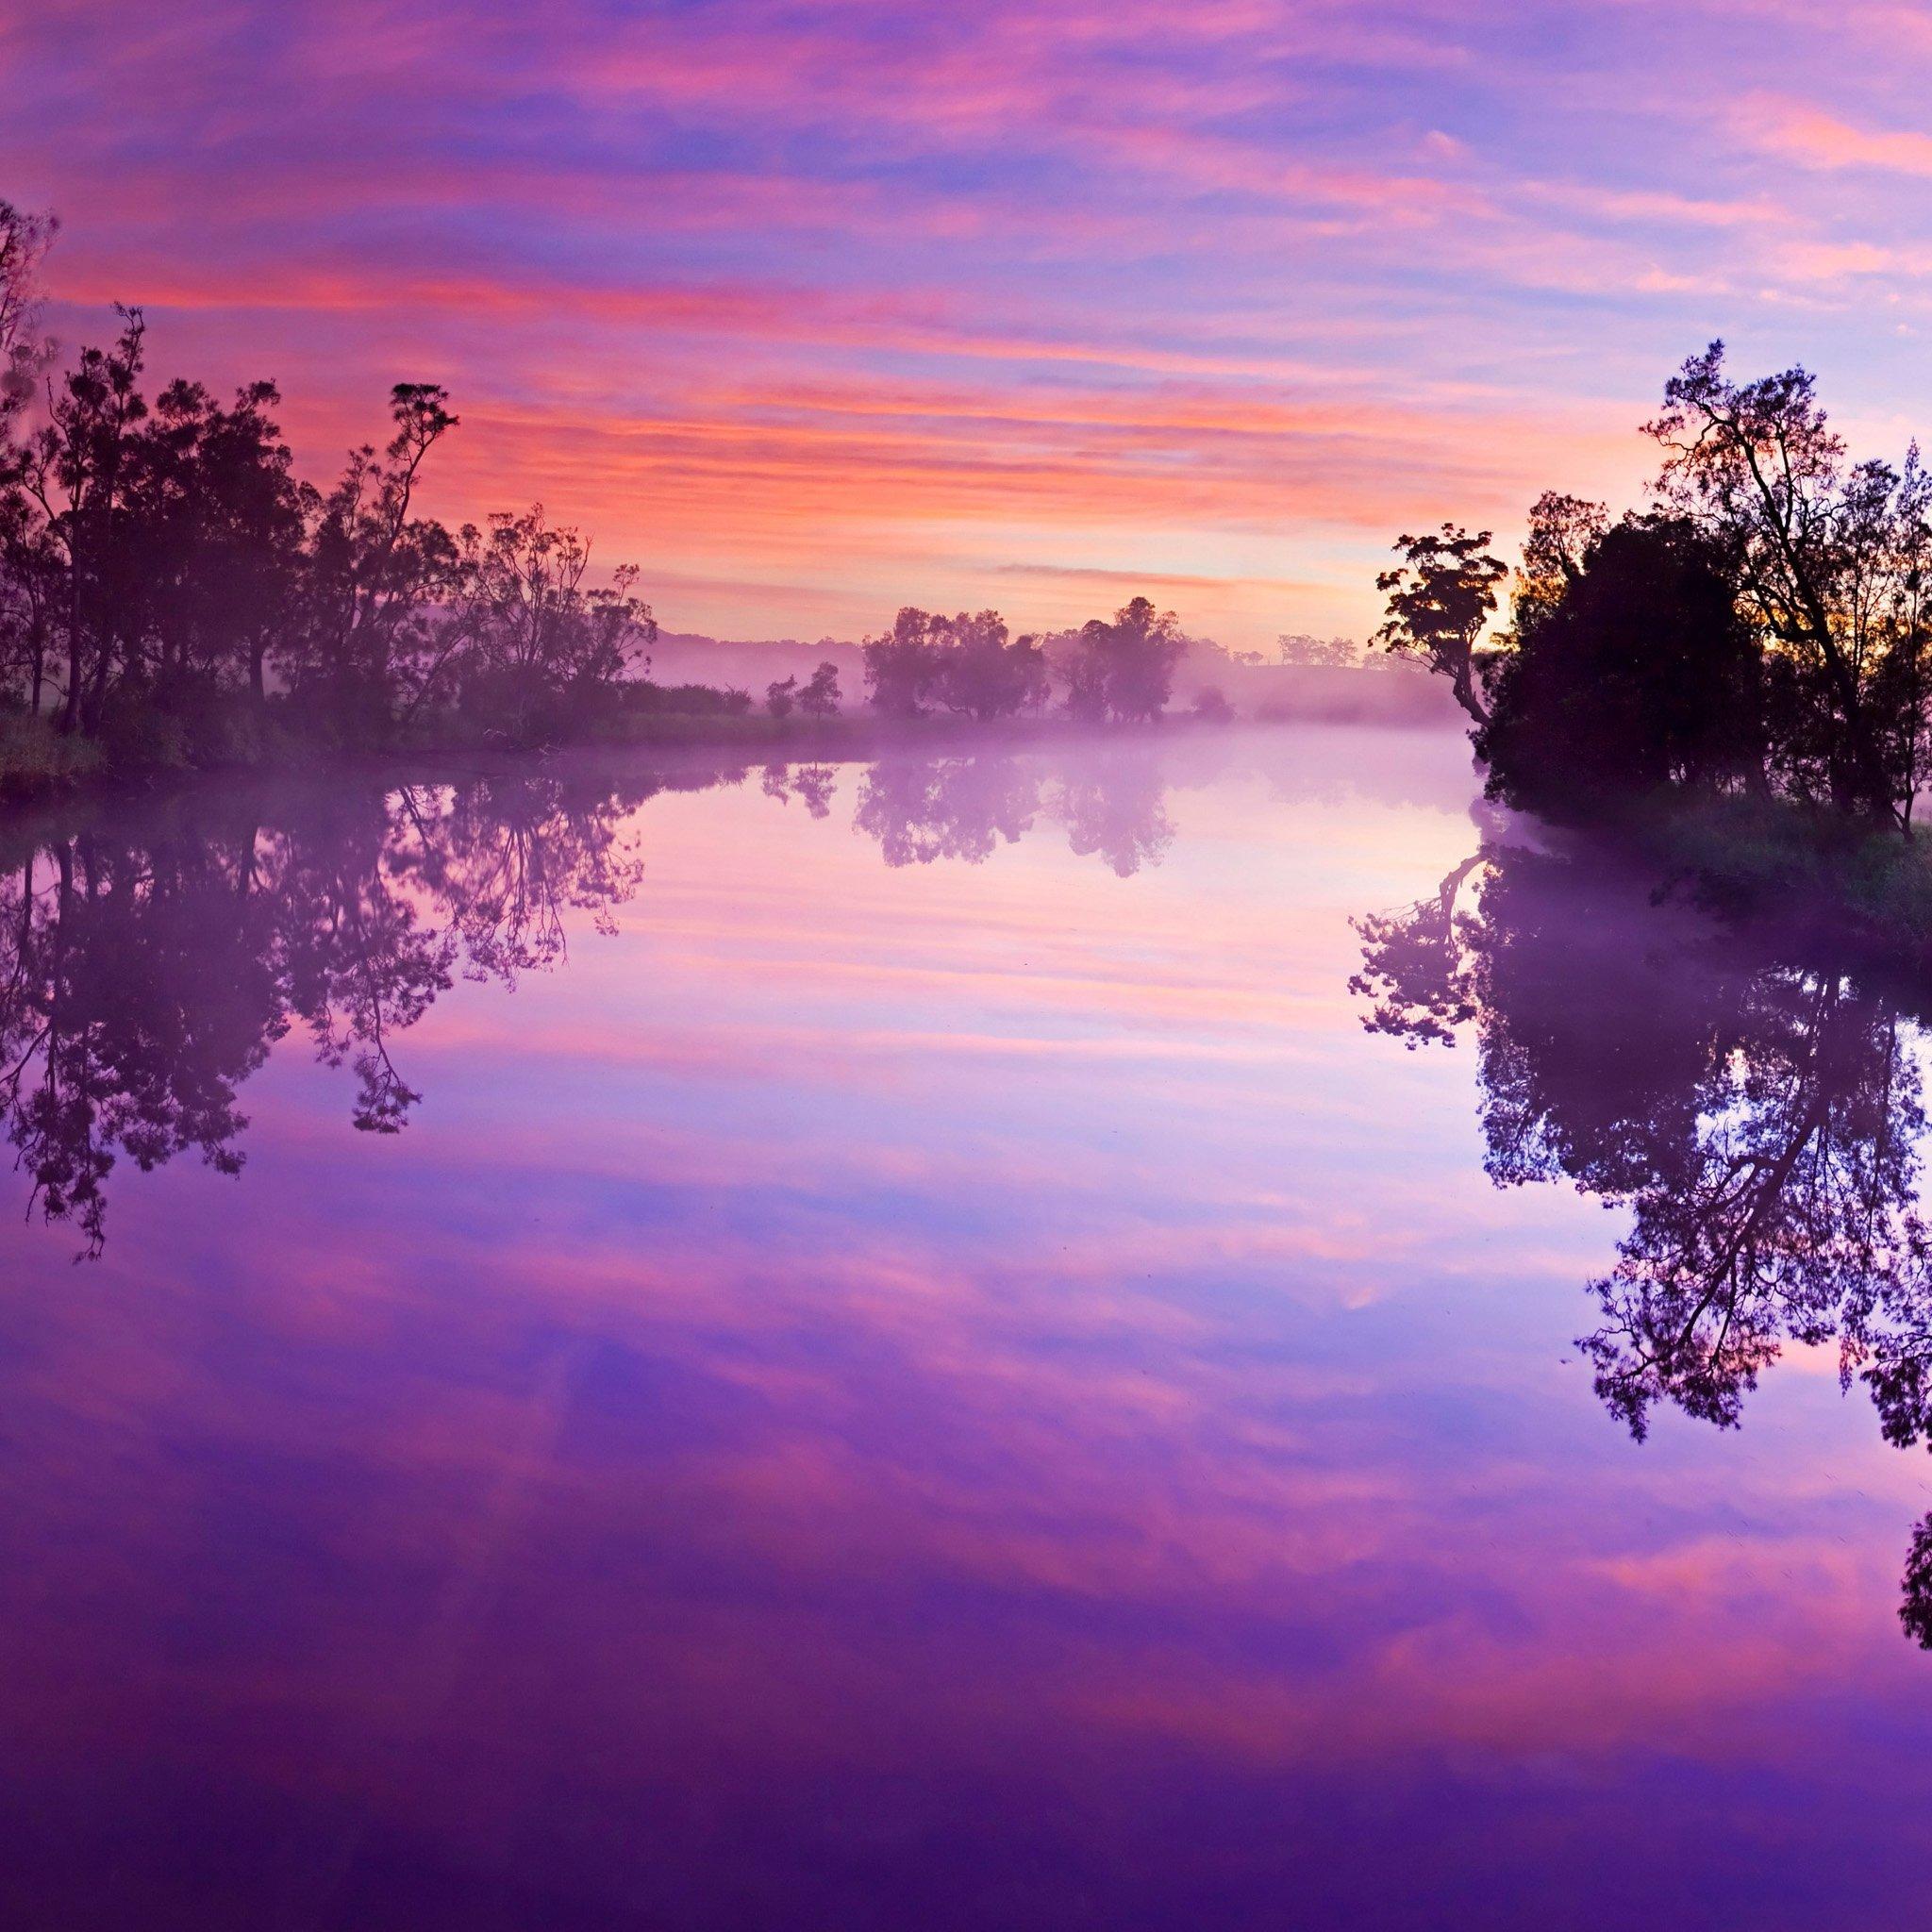 ipad风景紫色壁纸_ipad风景紫色壁纸下载